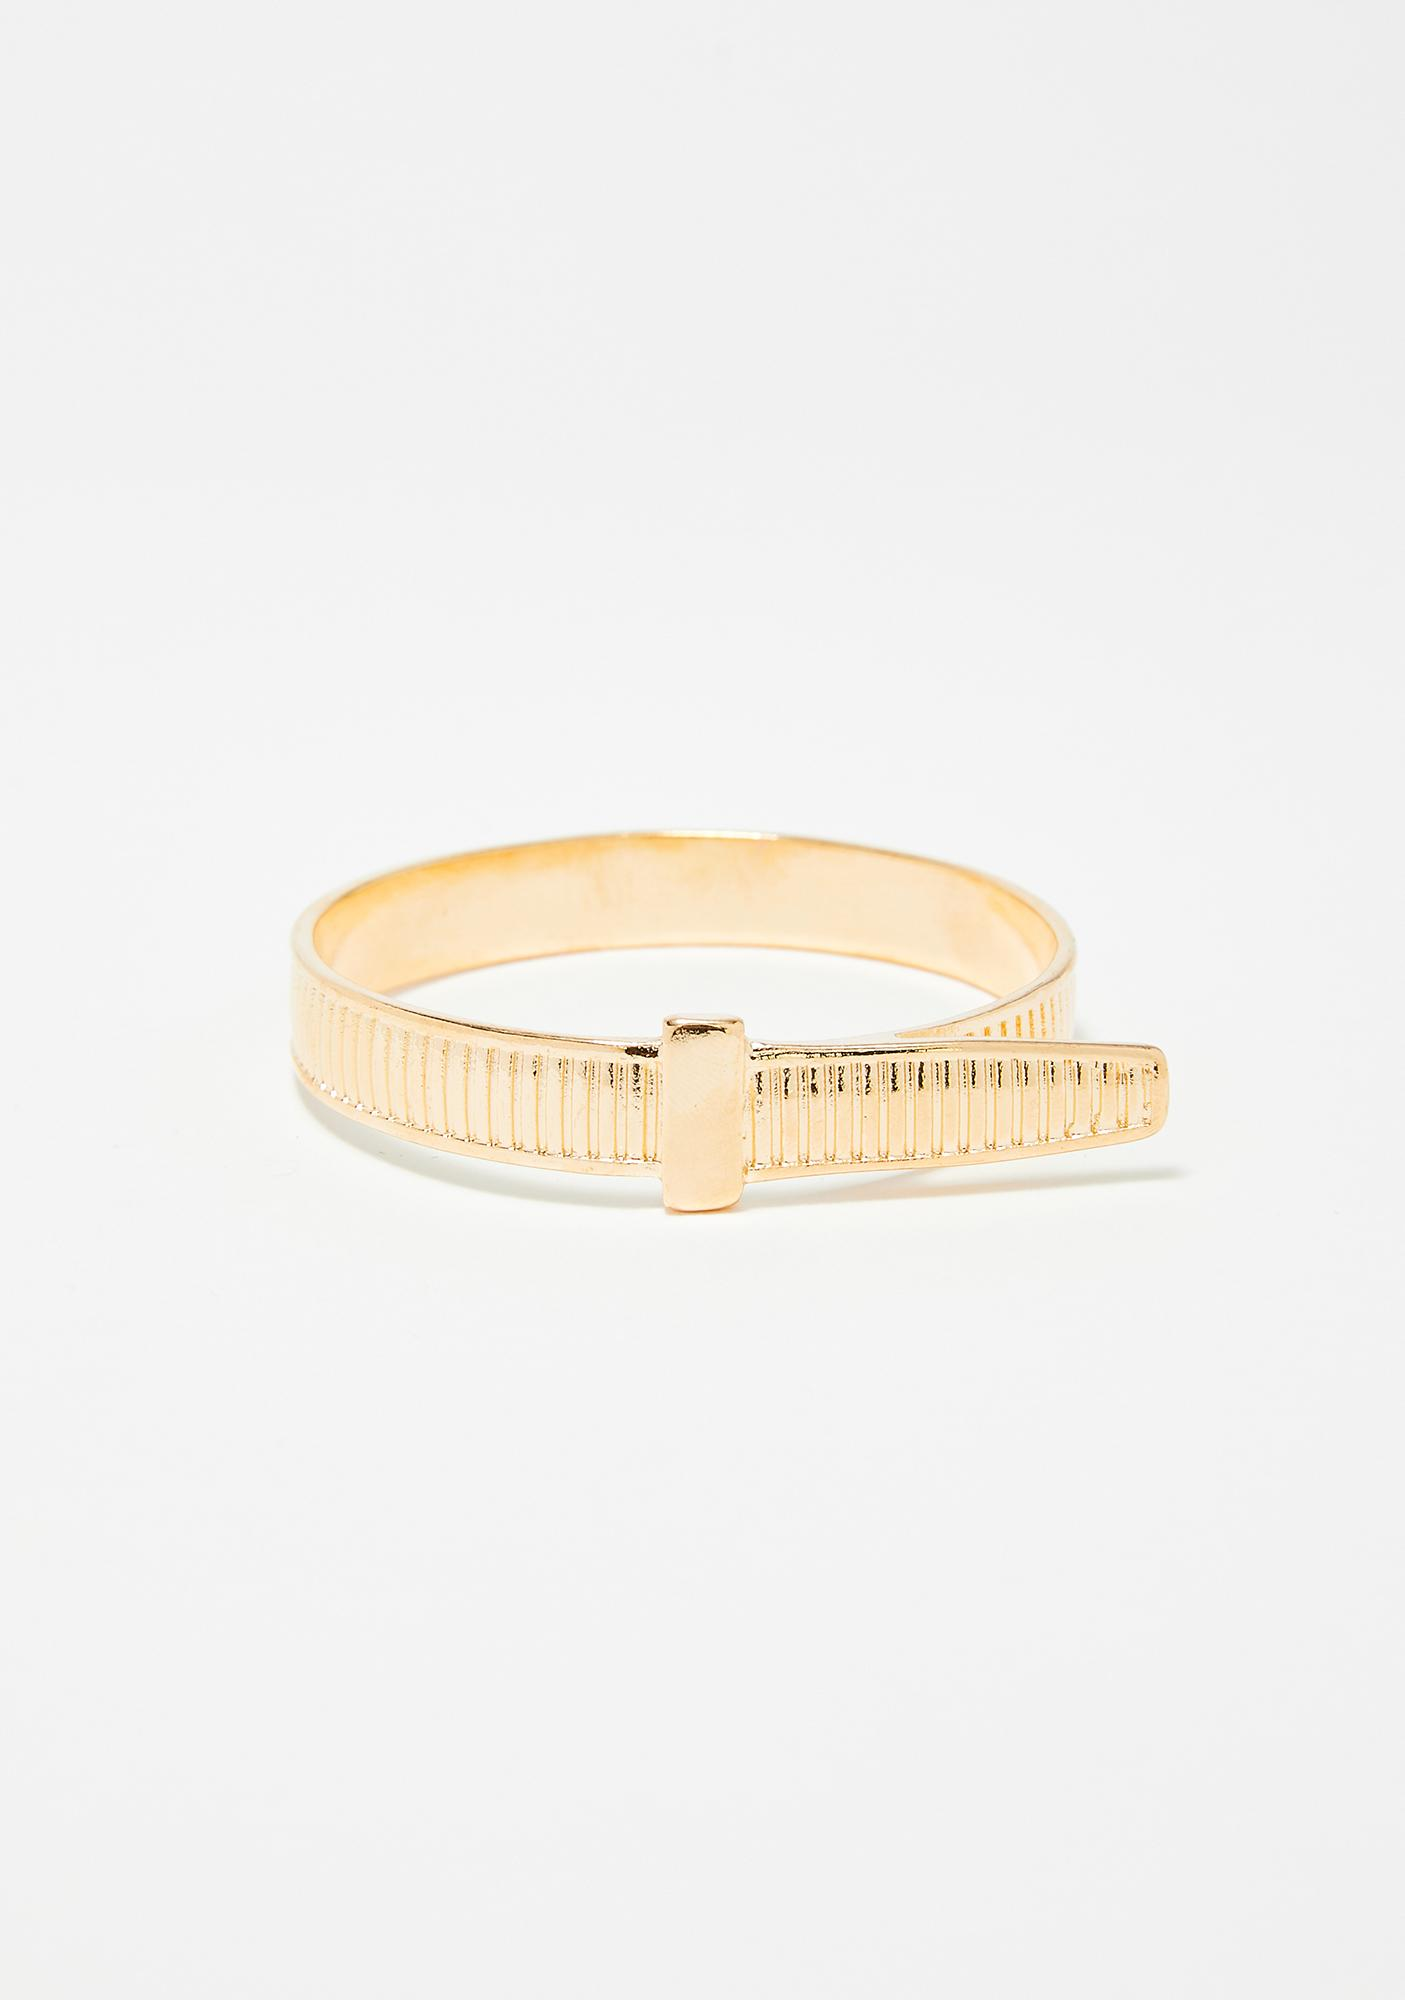 Stackin' It Up Gold Bracelet